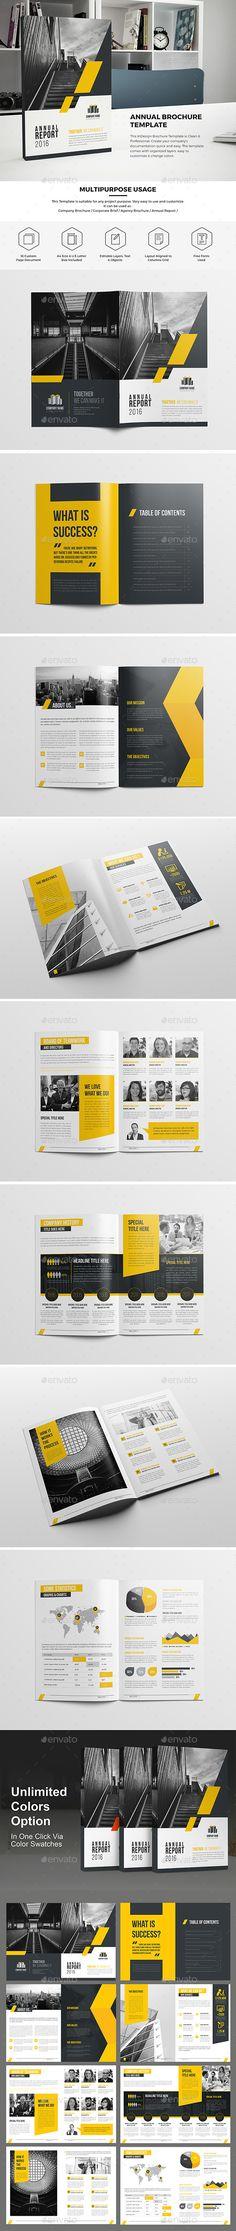 Haweya Annual Report by Haweya_Studio Haweya Annual Report InDesign Brochure Template is Clean & Professional. Create your companys documentation quick and easy Company Brochure, Corporate Brochure, Corporate Design, Brochure Design, Indesign Brochure Templates, Flyer Design Templates, Editorial Design, Web Design, Creative Design